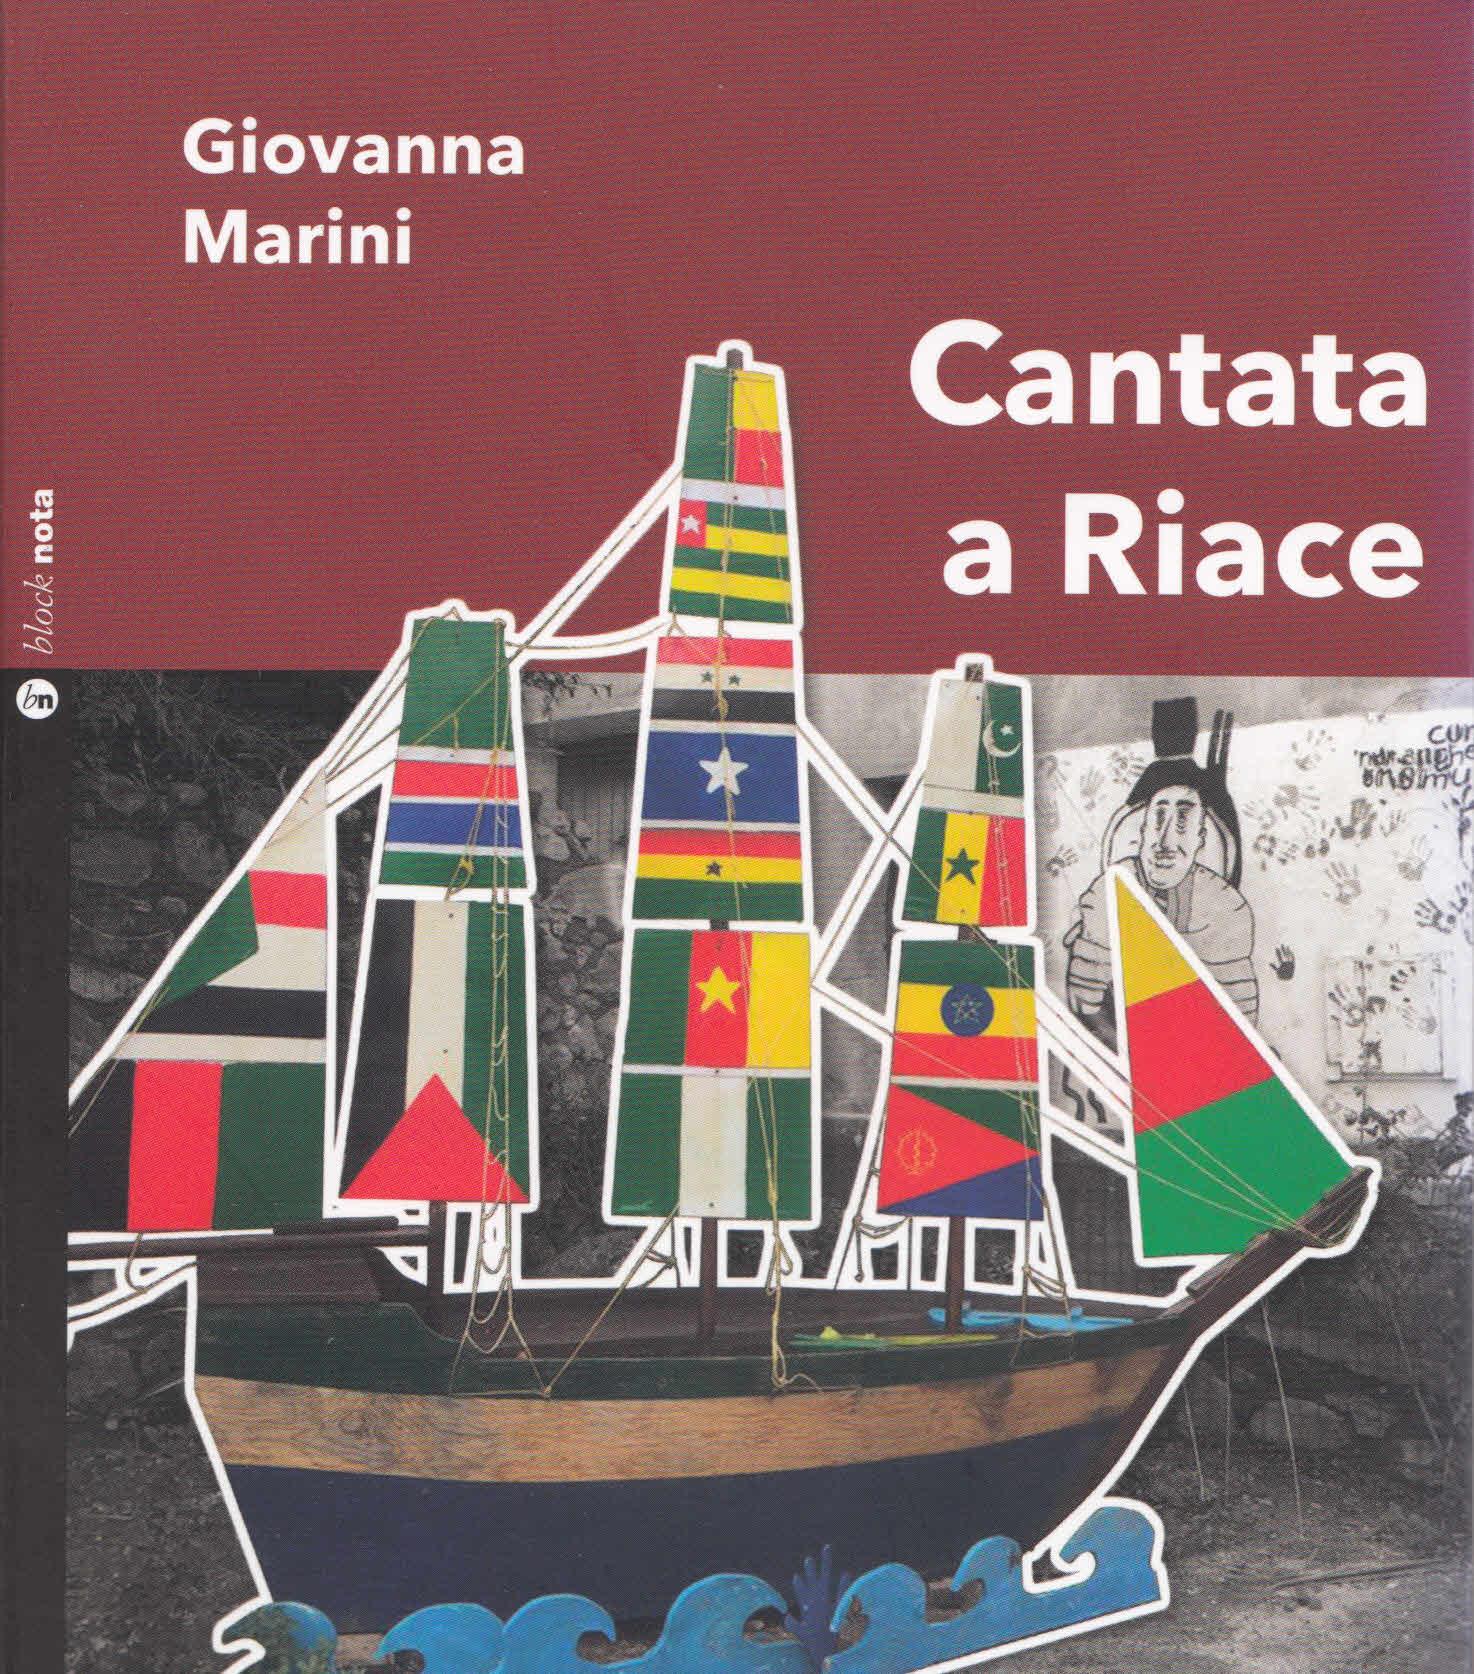 Cantata a Riace Giovanna Marini